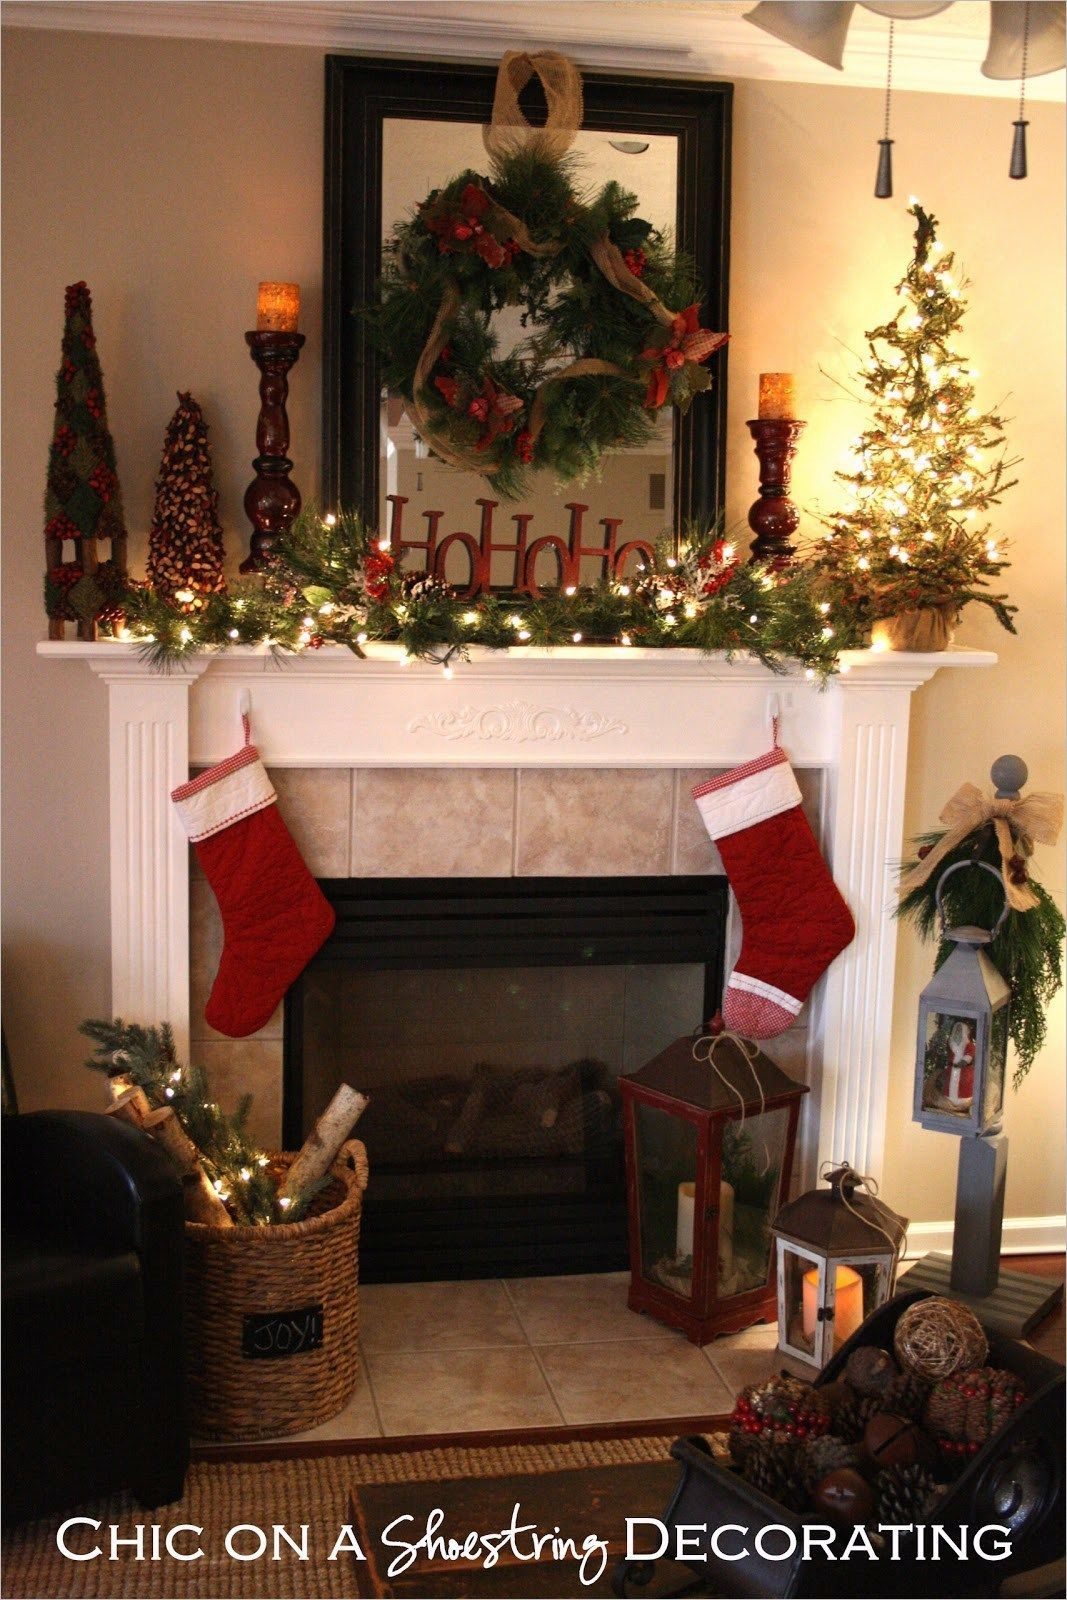 Creative Rustic Christmas Fireplace Mantel Décor Ideas 37